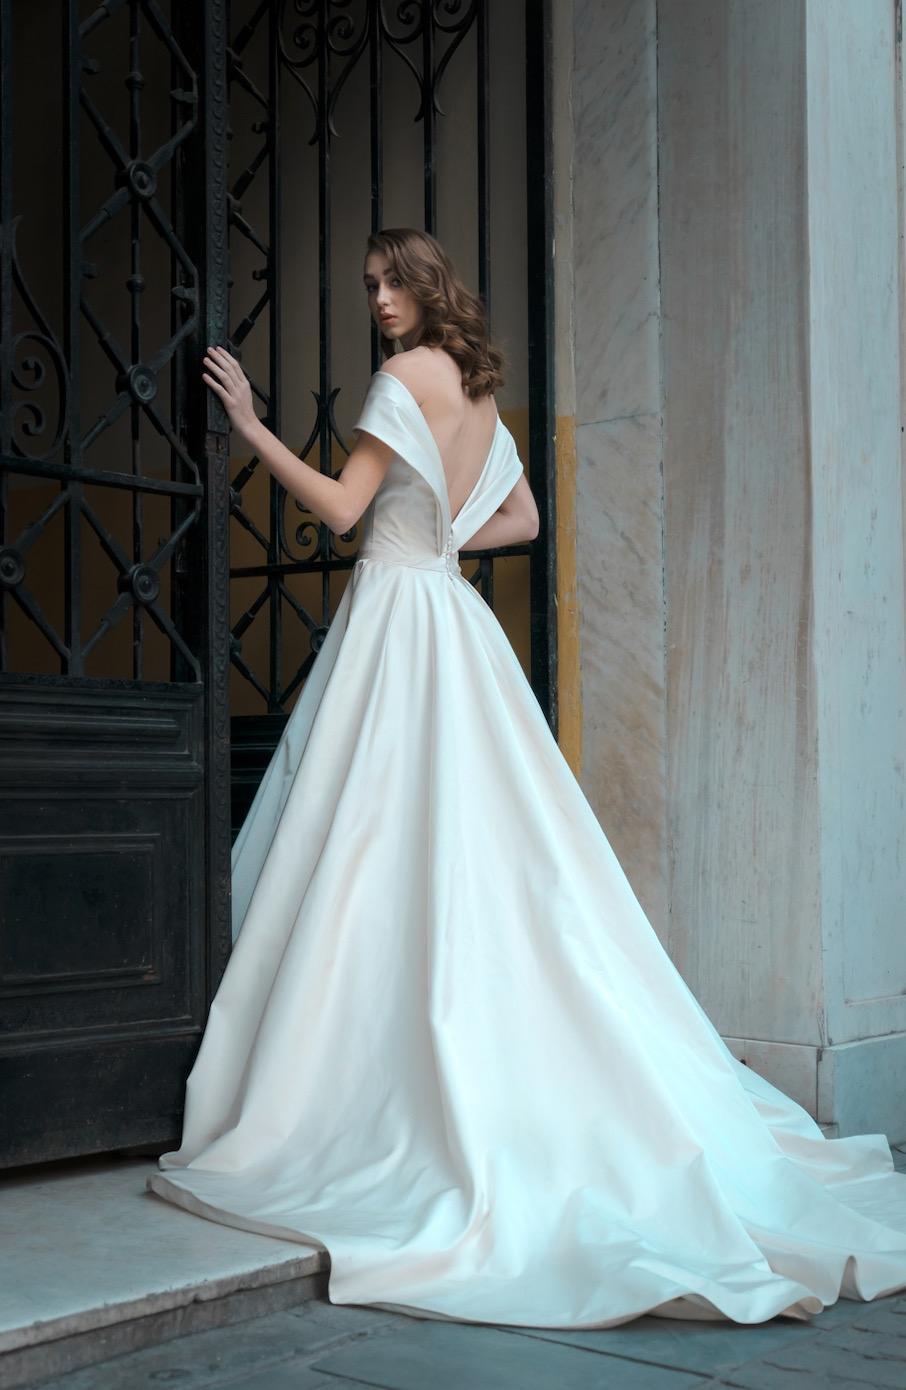 Bridal-Alkmini-08180.jpg